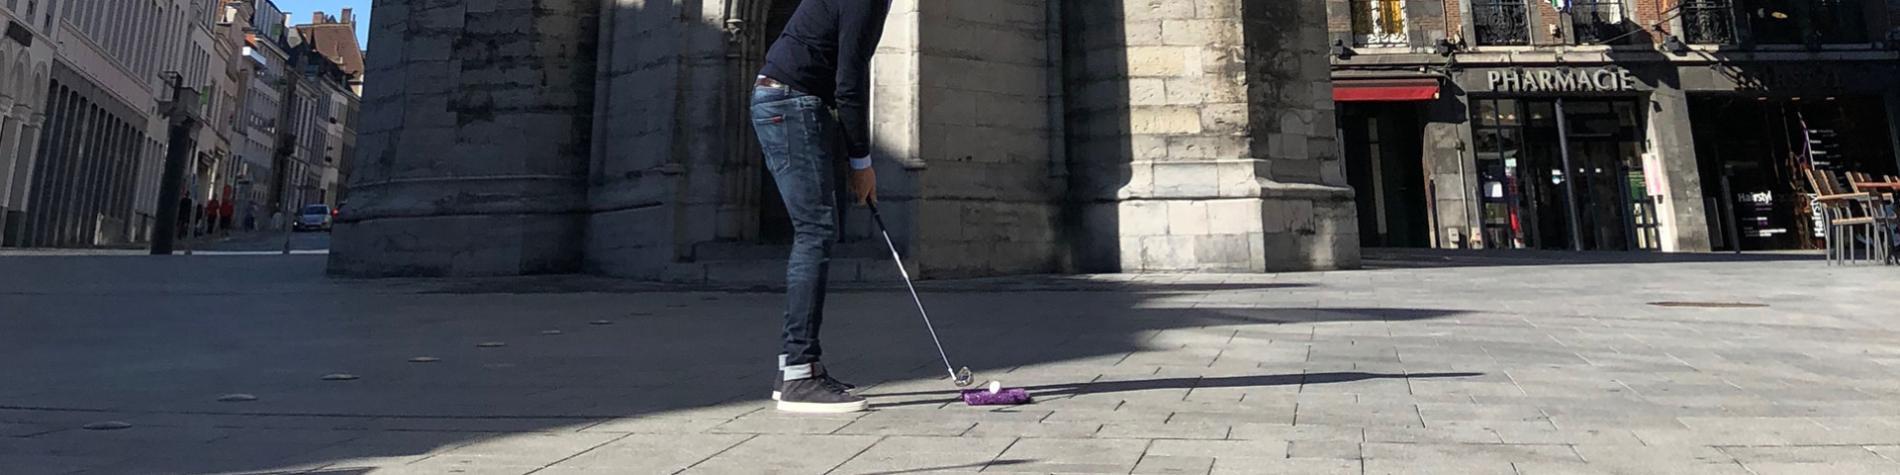 Le City Golf - Visitez Tournai pratiquer - golf urbain